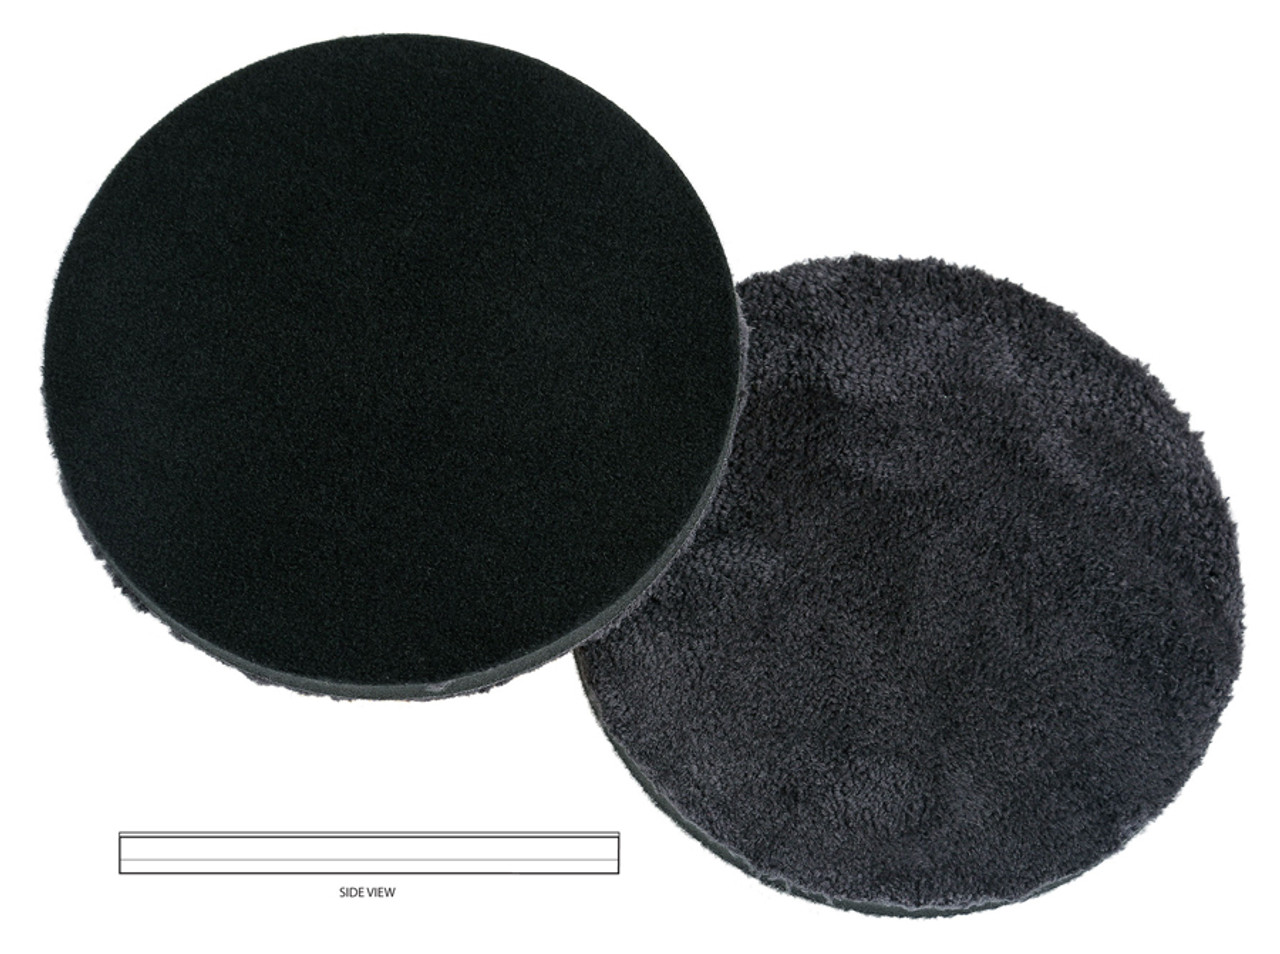 lake country microfiber polishing pad 6 www carpro. Black Bedroom Furniture Sets. Home Design Ideas